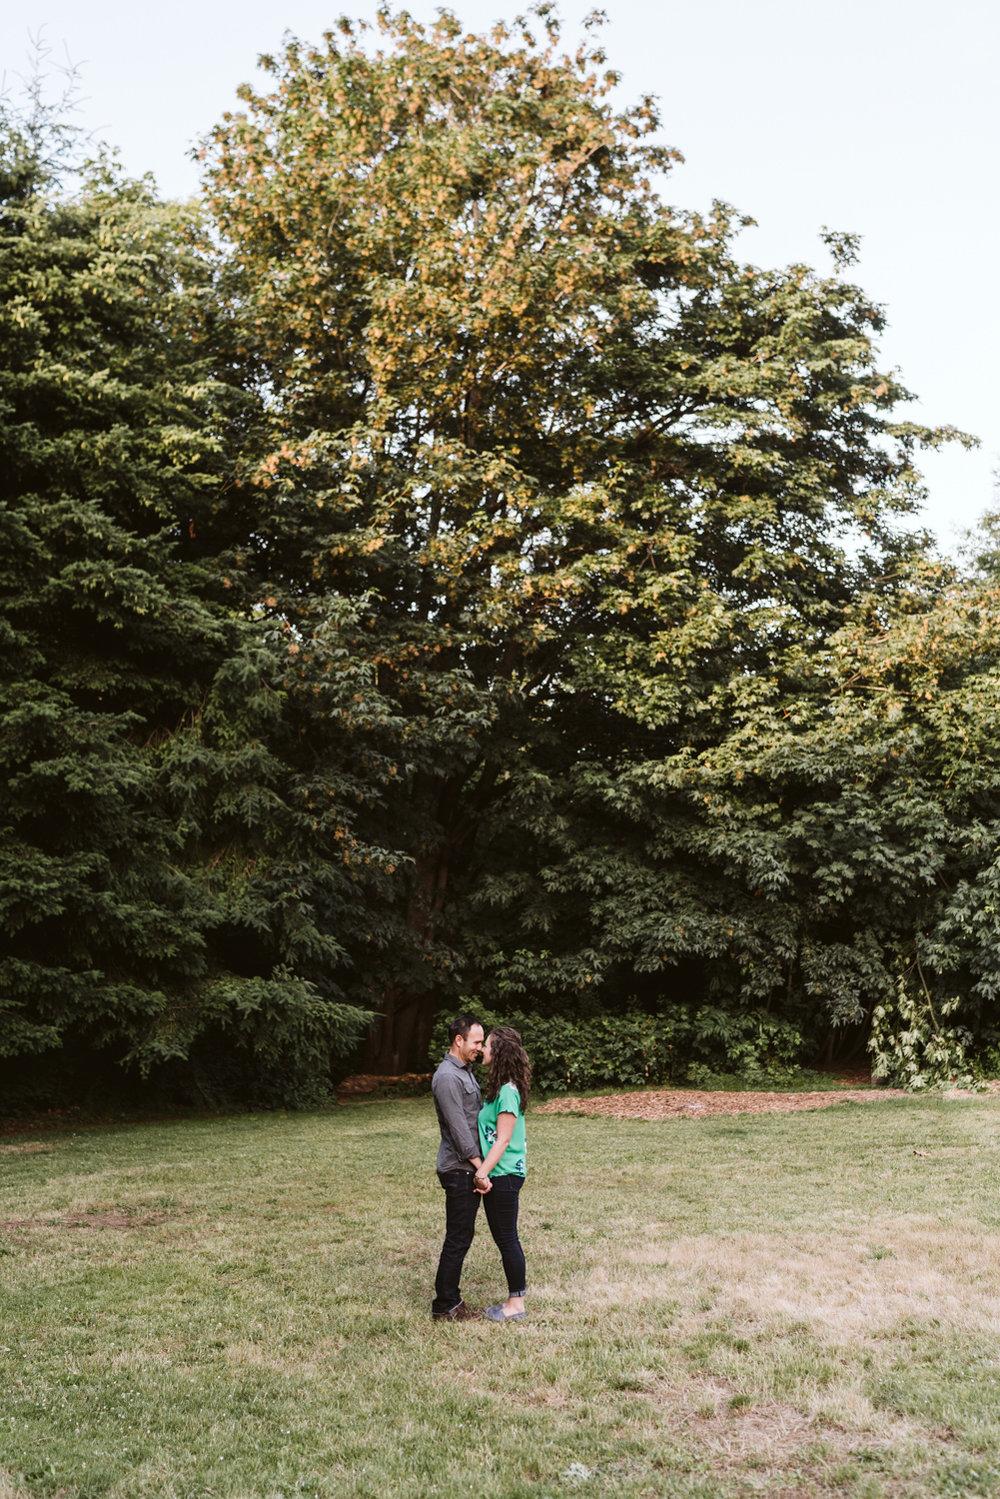 April Yentas Photography - katie & taylor blog-8.jpg